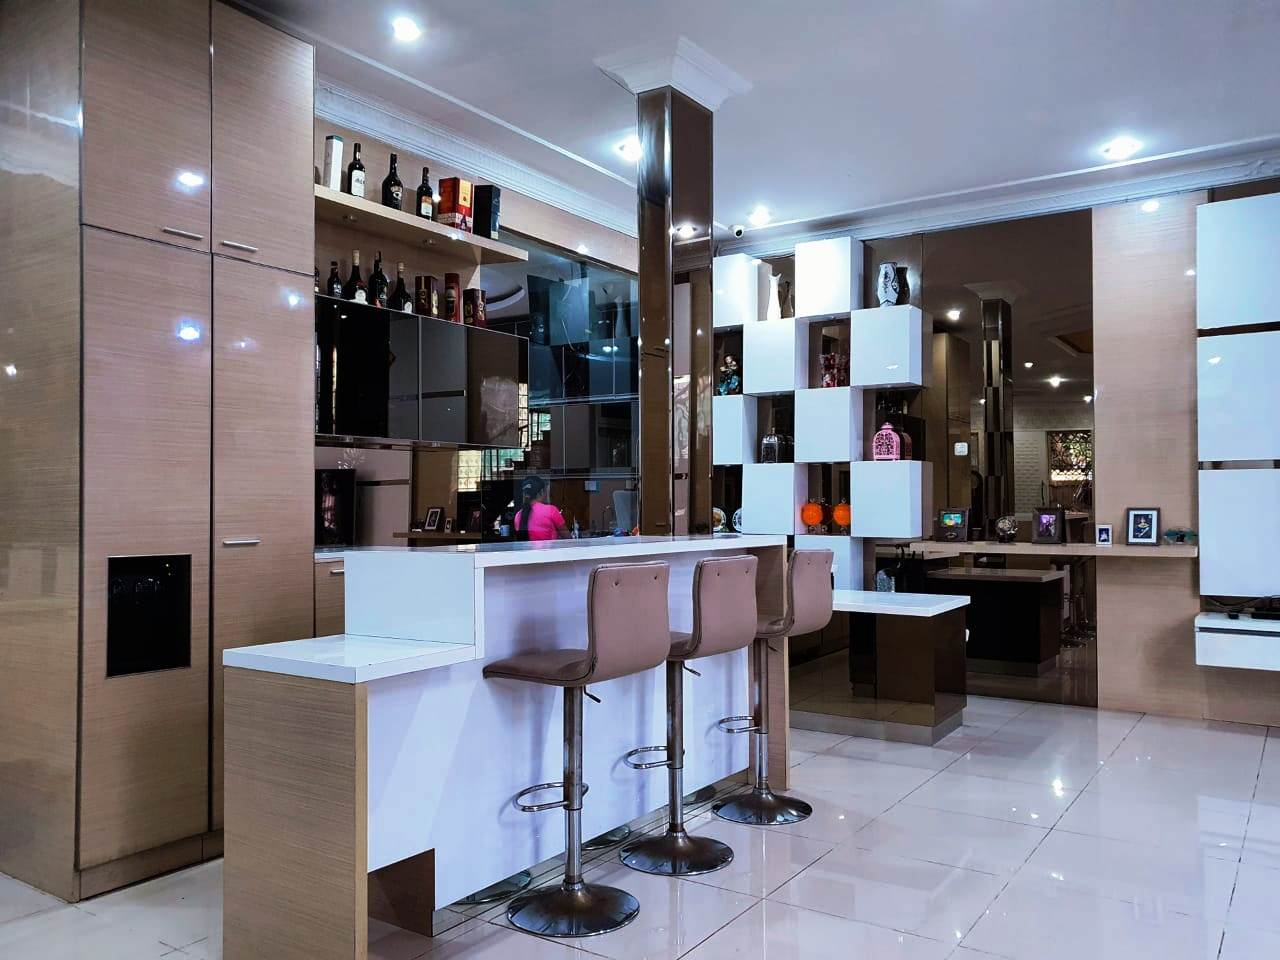 Rumah Mewah Hoek Fully Furnished Kelapa Gading Jakarta Utara - 7